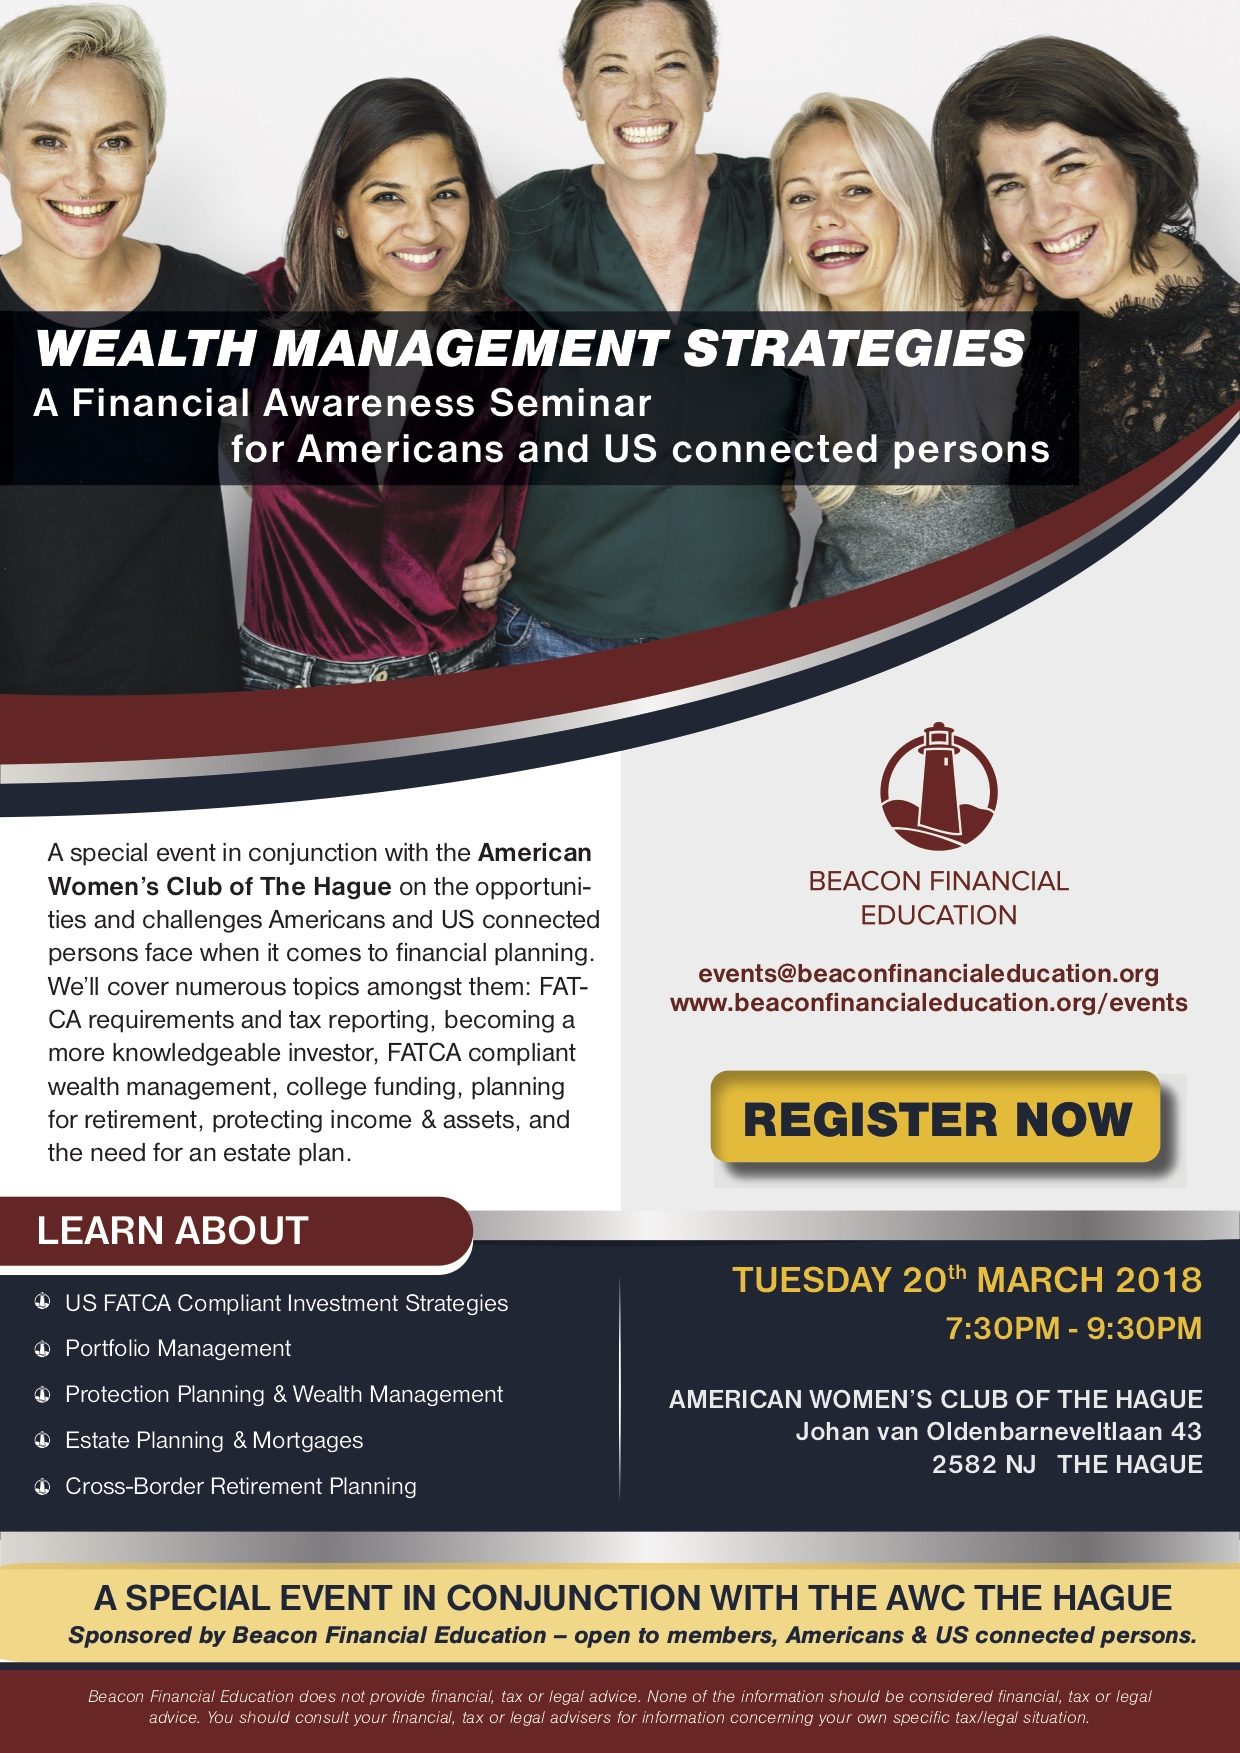 Financial Awareness Seminar The Hague, AWC 20 March